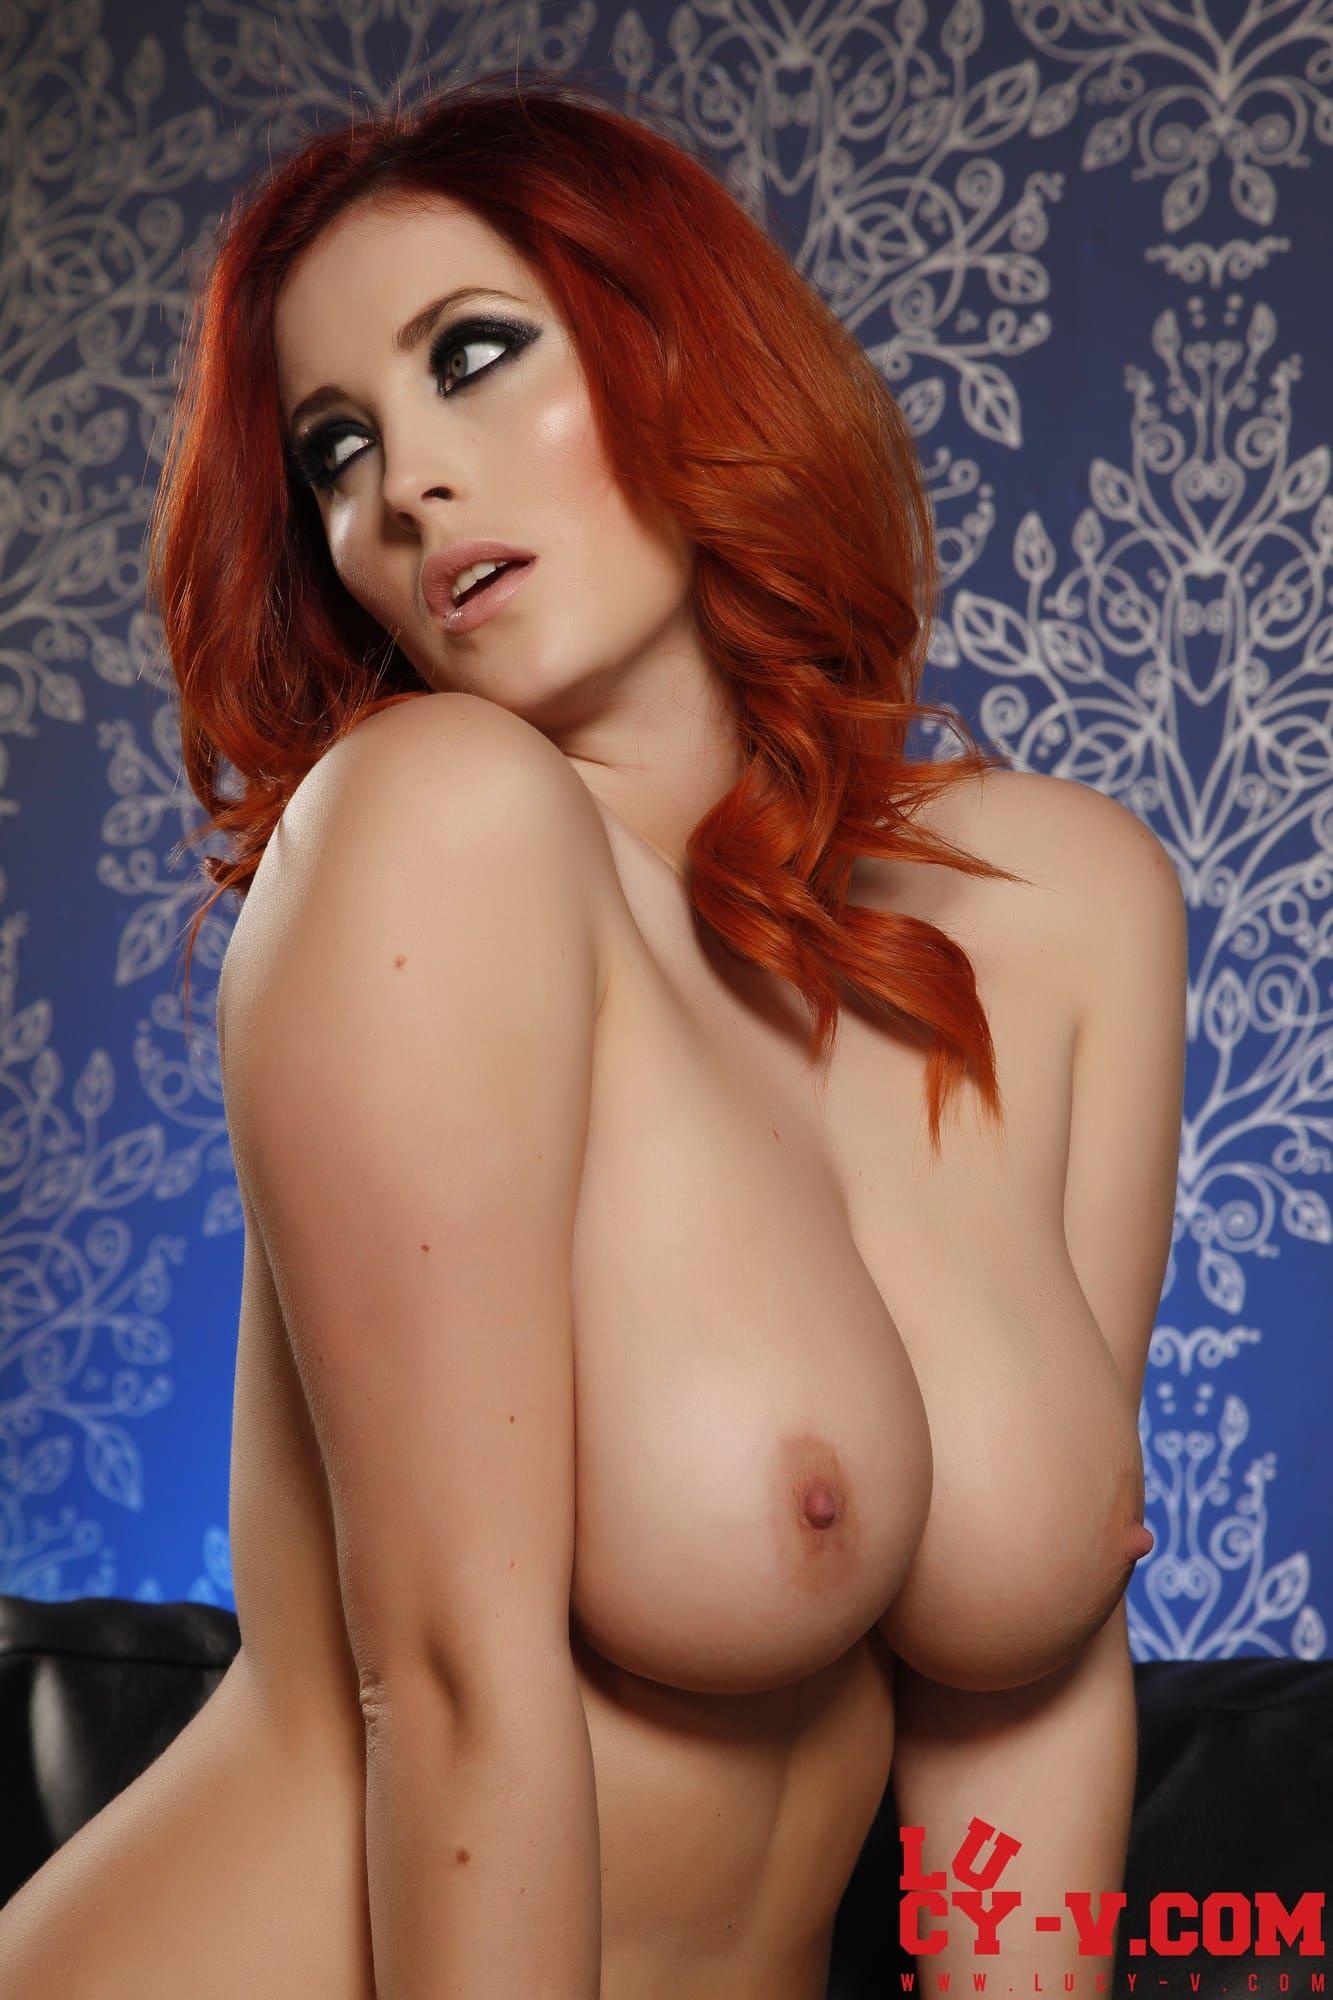 topless lingerie